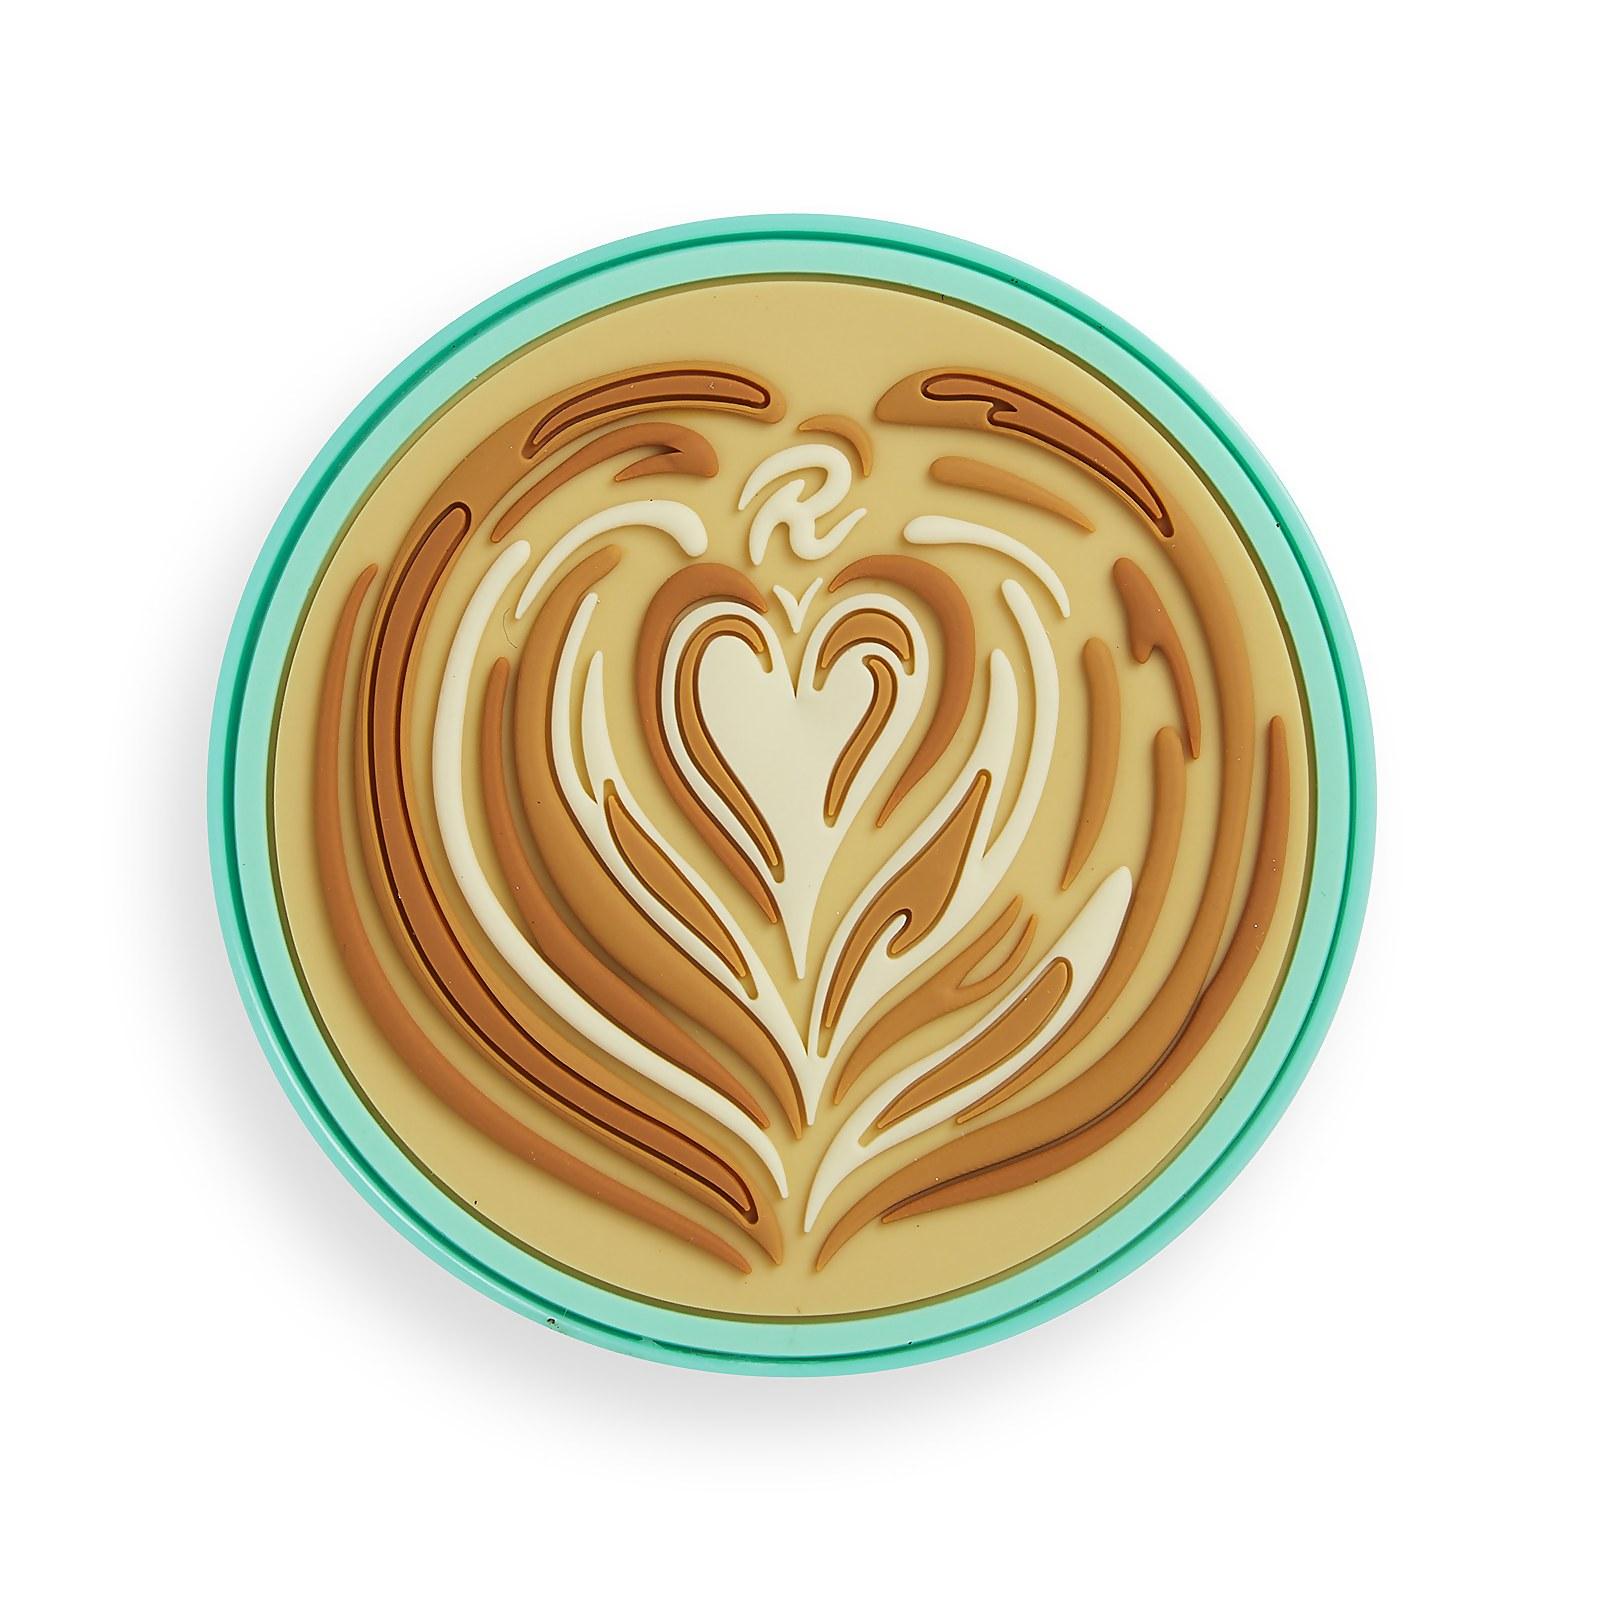 Купить Revolution I Heart Revolution Tasty Coffee Bronzer - Latte